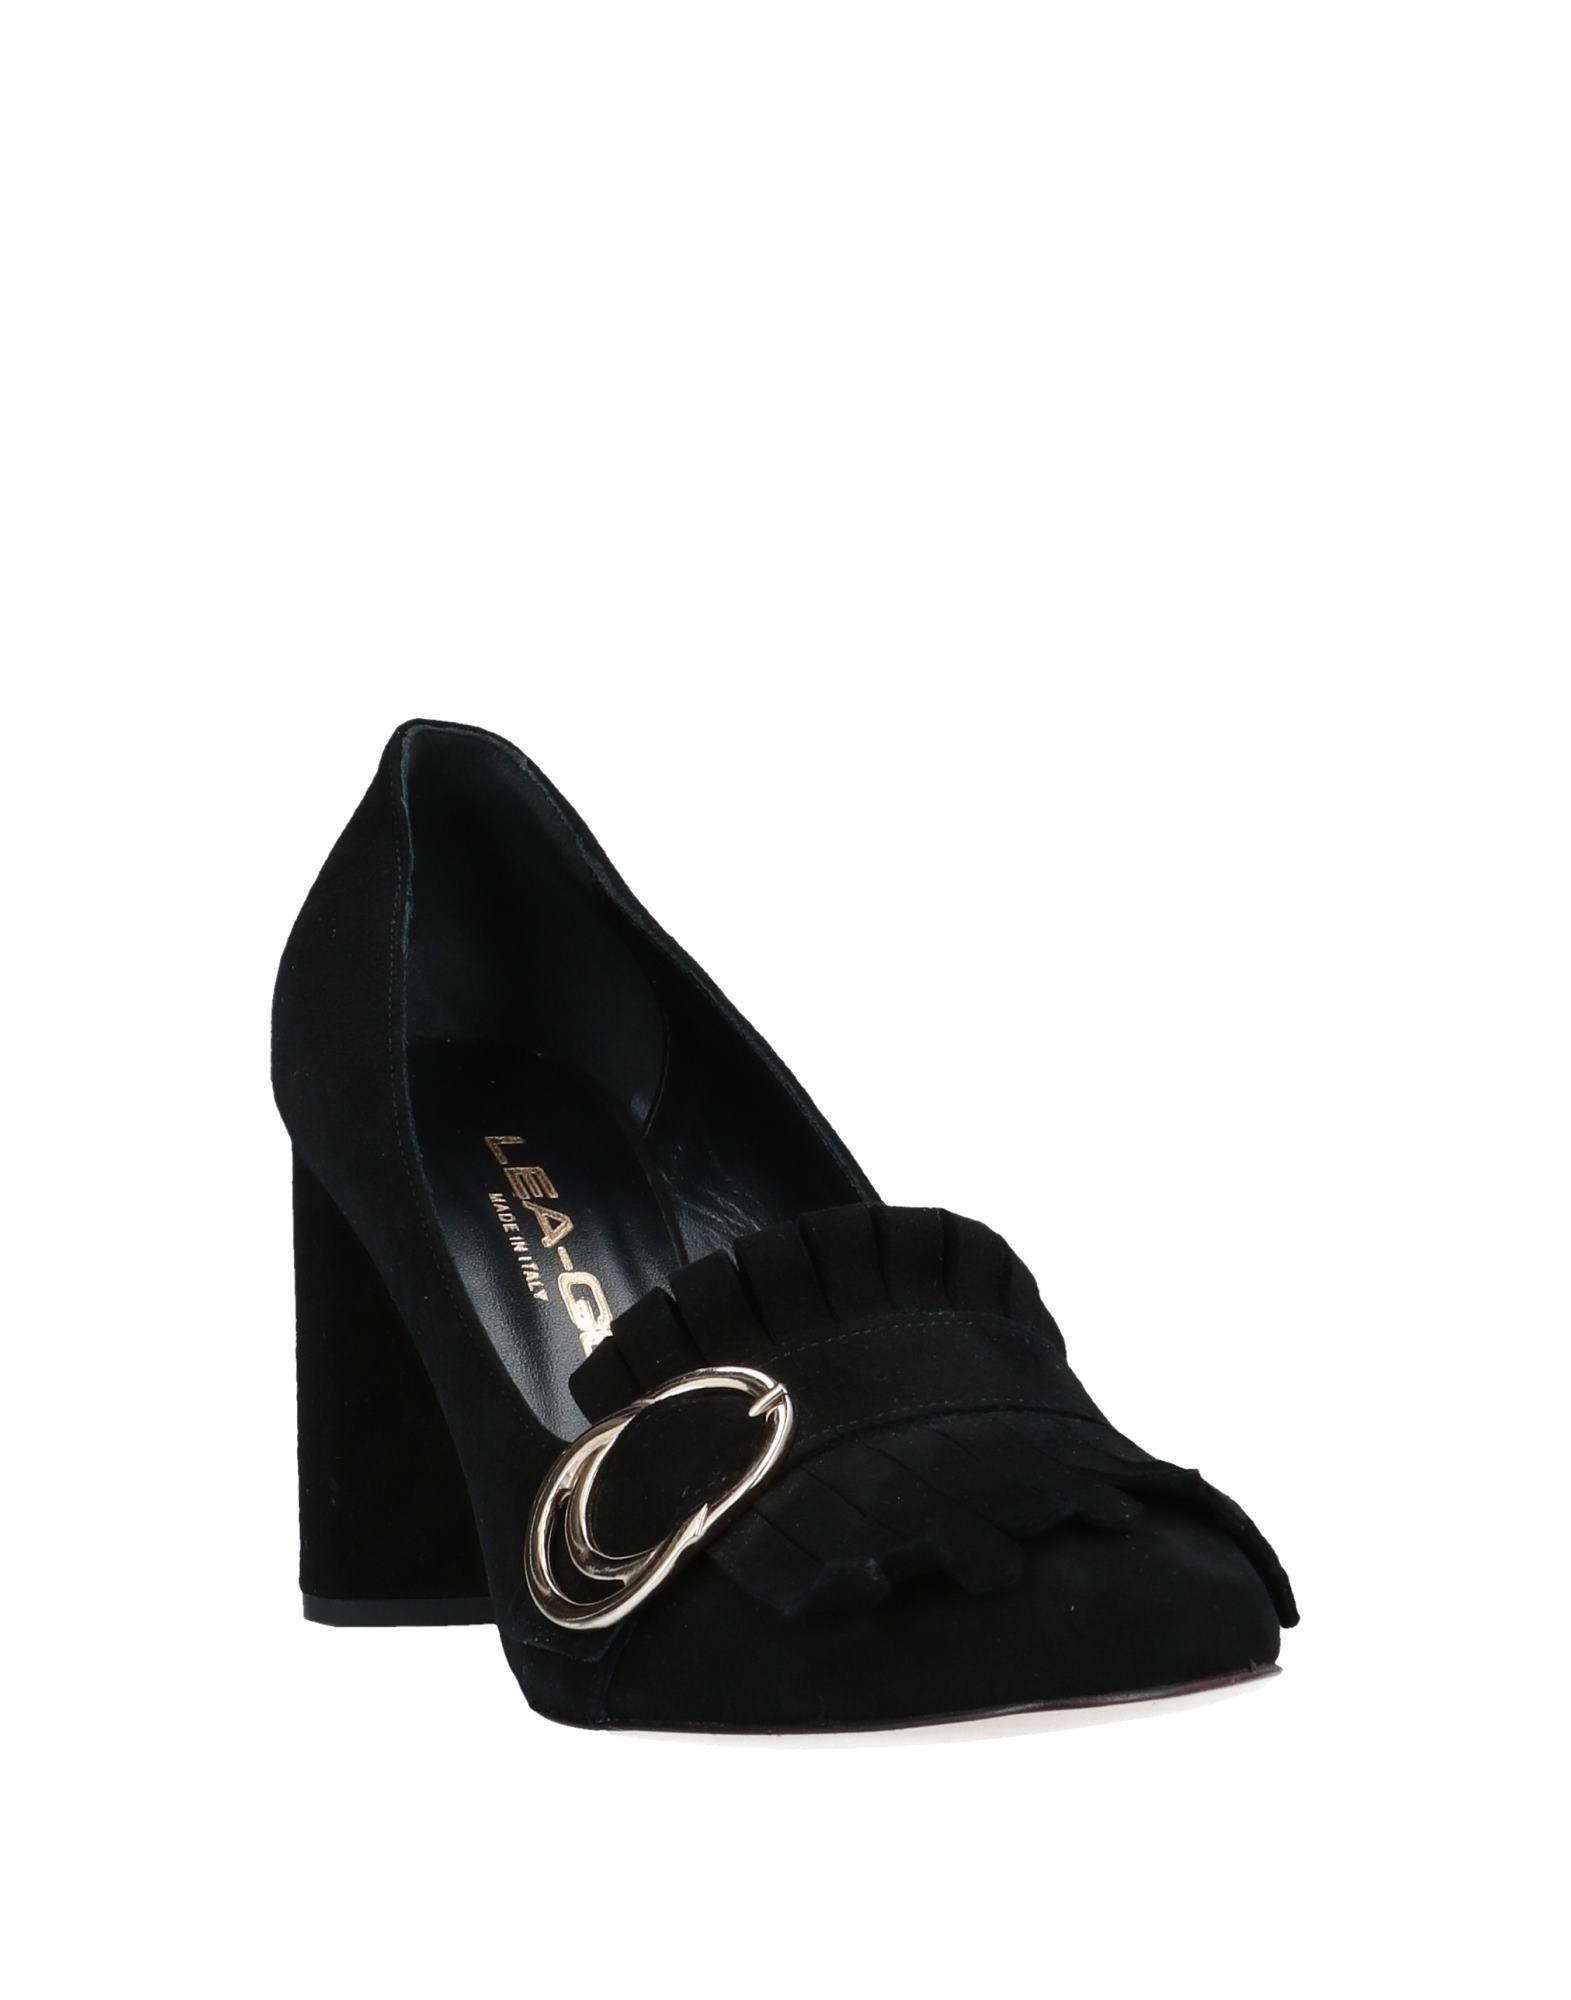 Lea 11559373AT Gute Gute 11559373AT Qualität beliebte Schuhe ad55a4